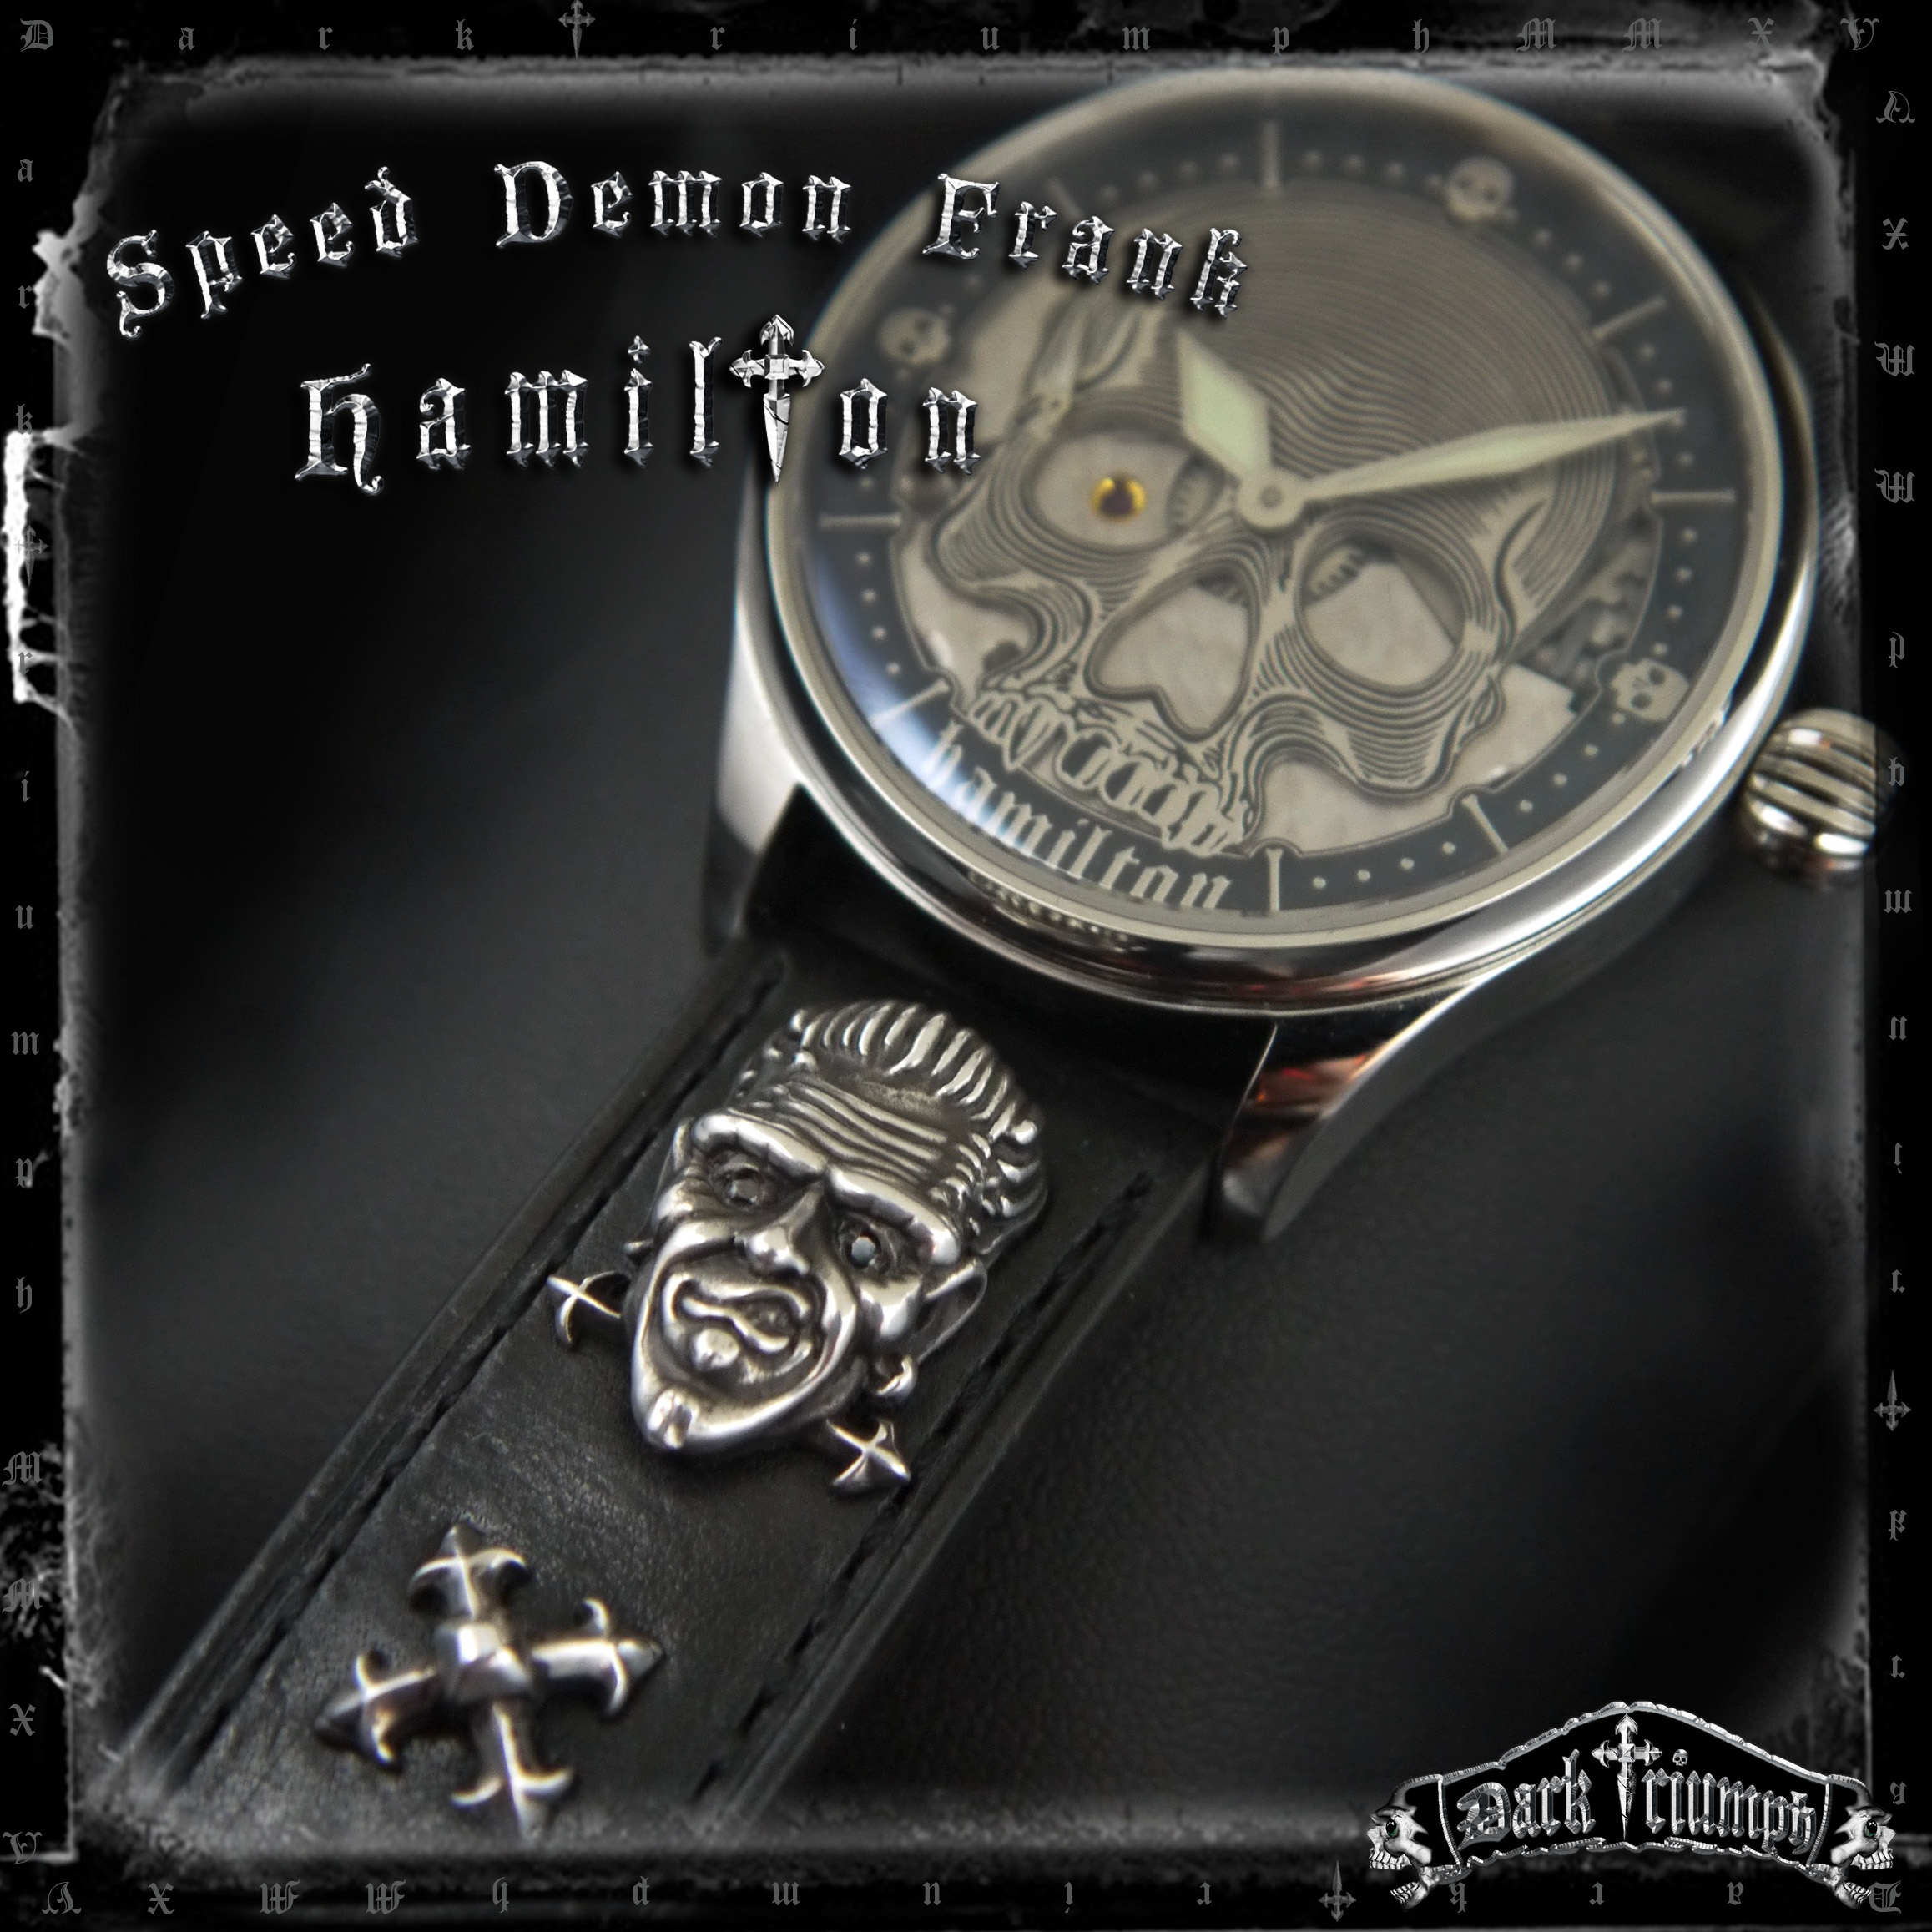 speed-demon-frank-hamilton-titled-iso-.jpg